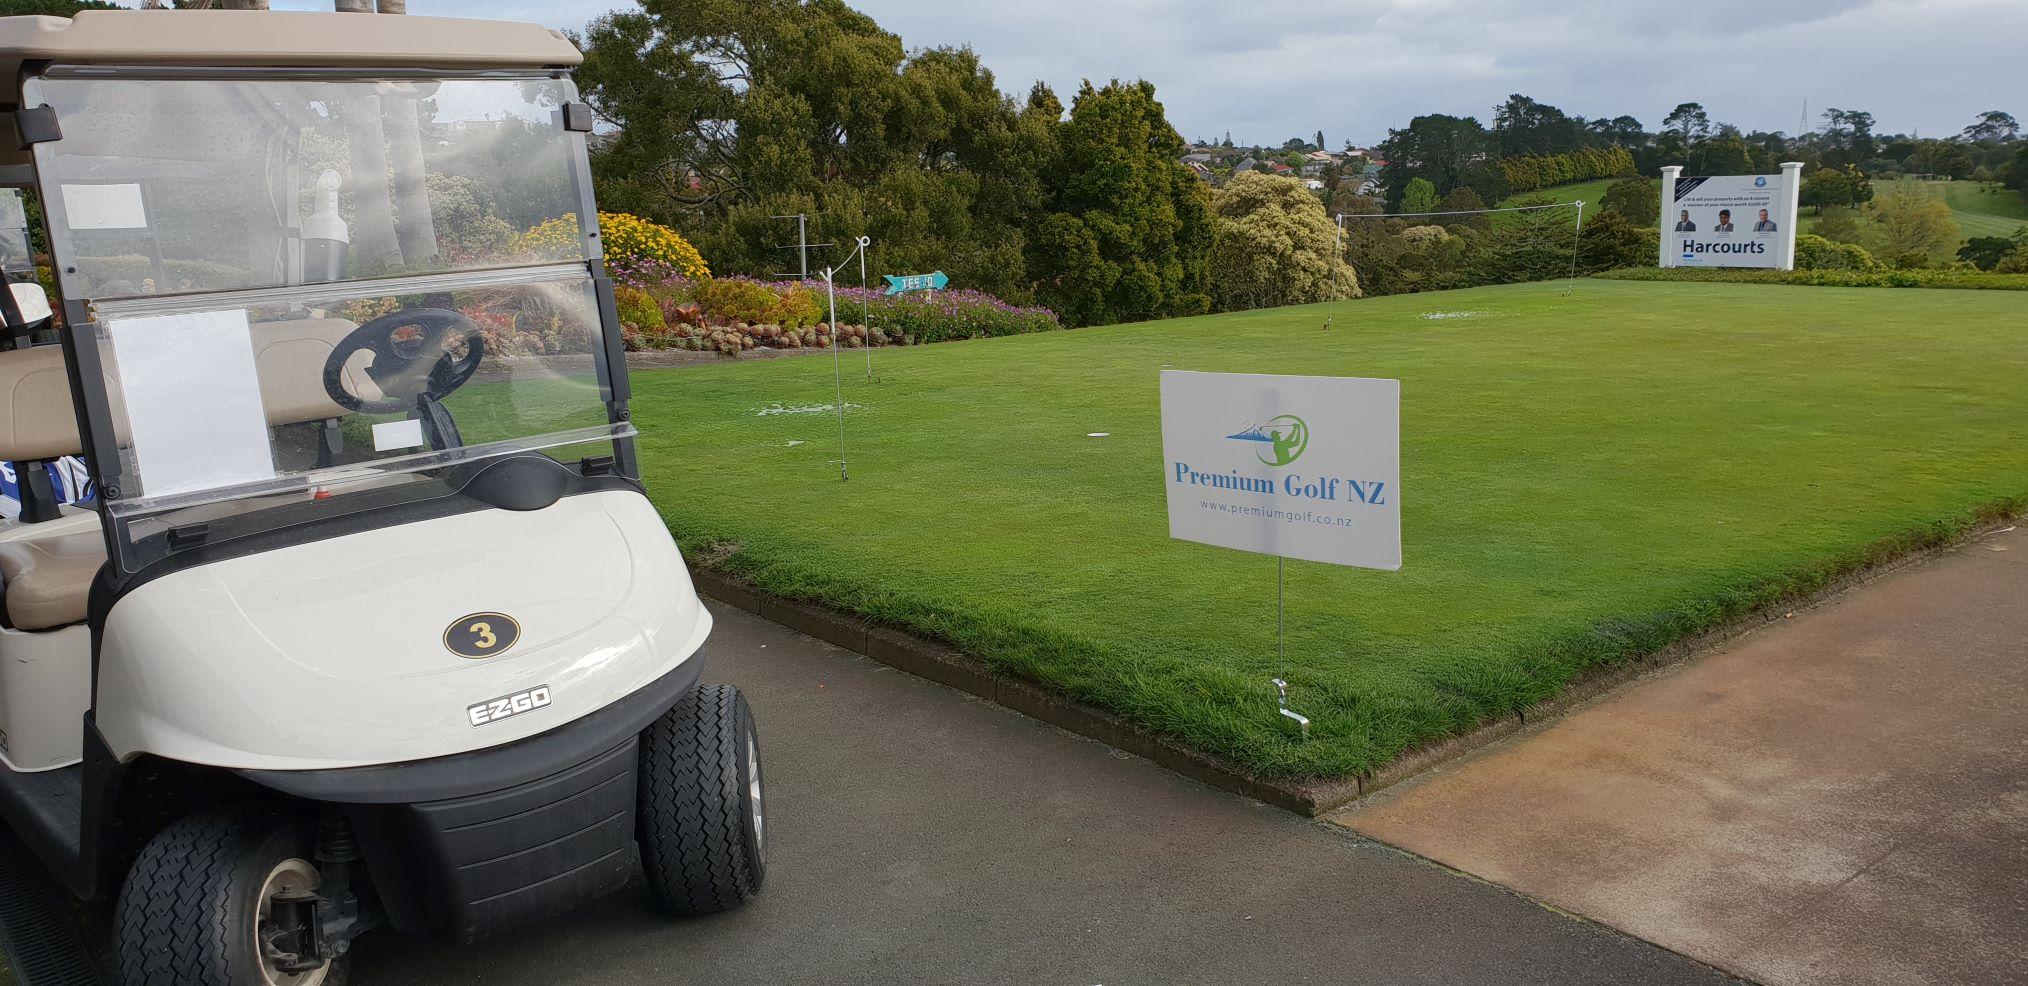 Putting Green and Cart Premium Golf NZ Twilight Series.jpg